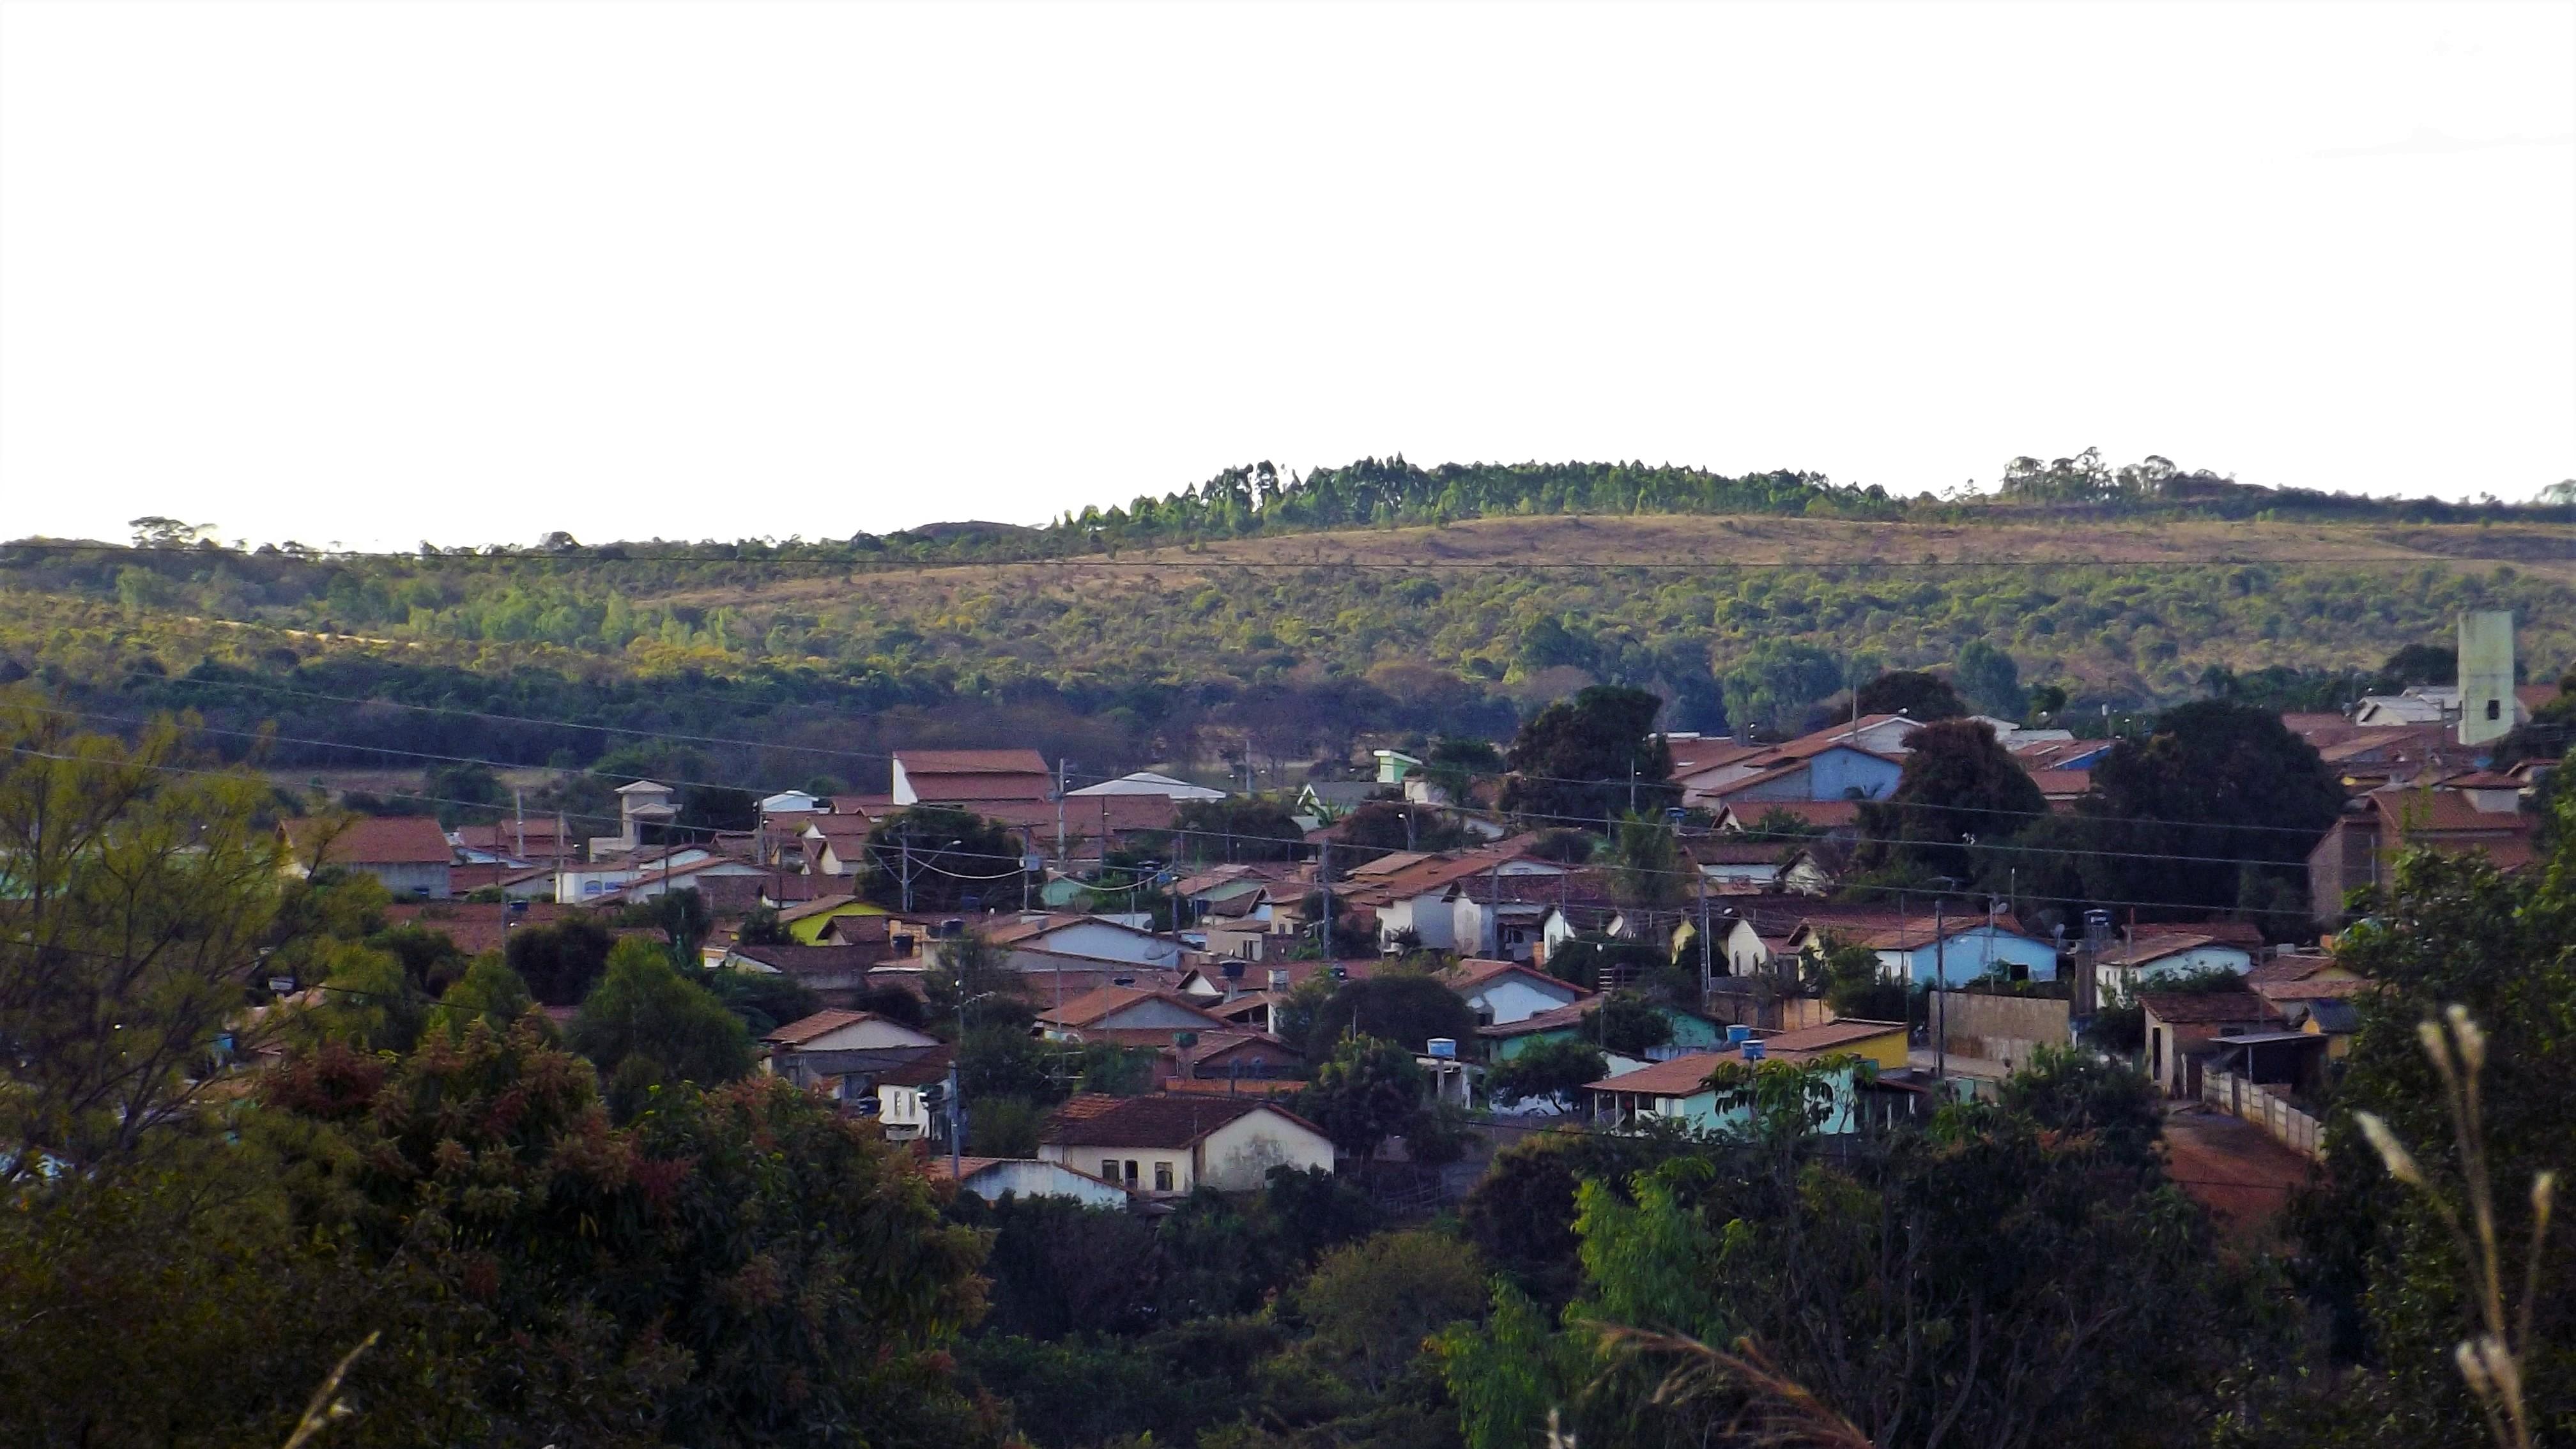 Lagamar Minas Gerais fonte: upload.wikimedia.org